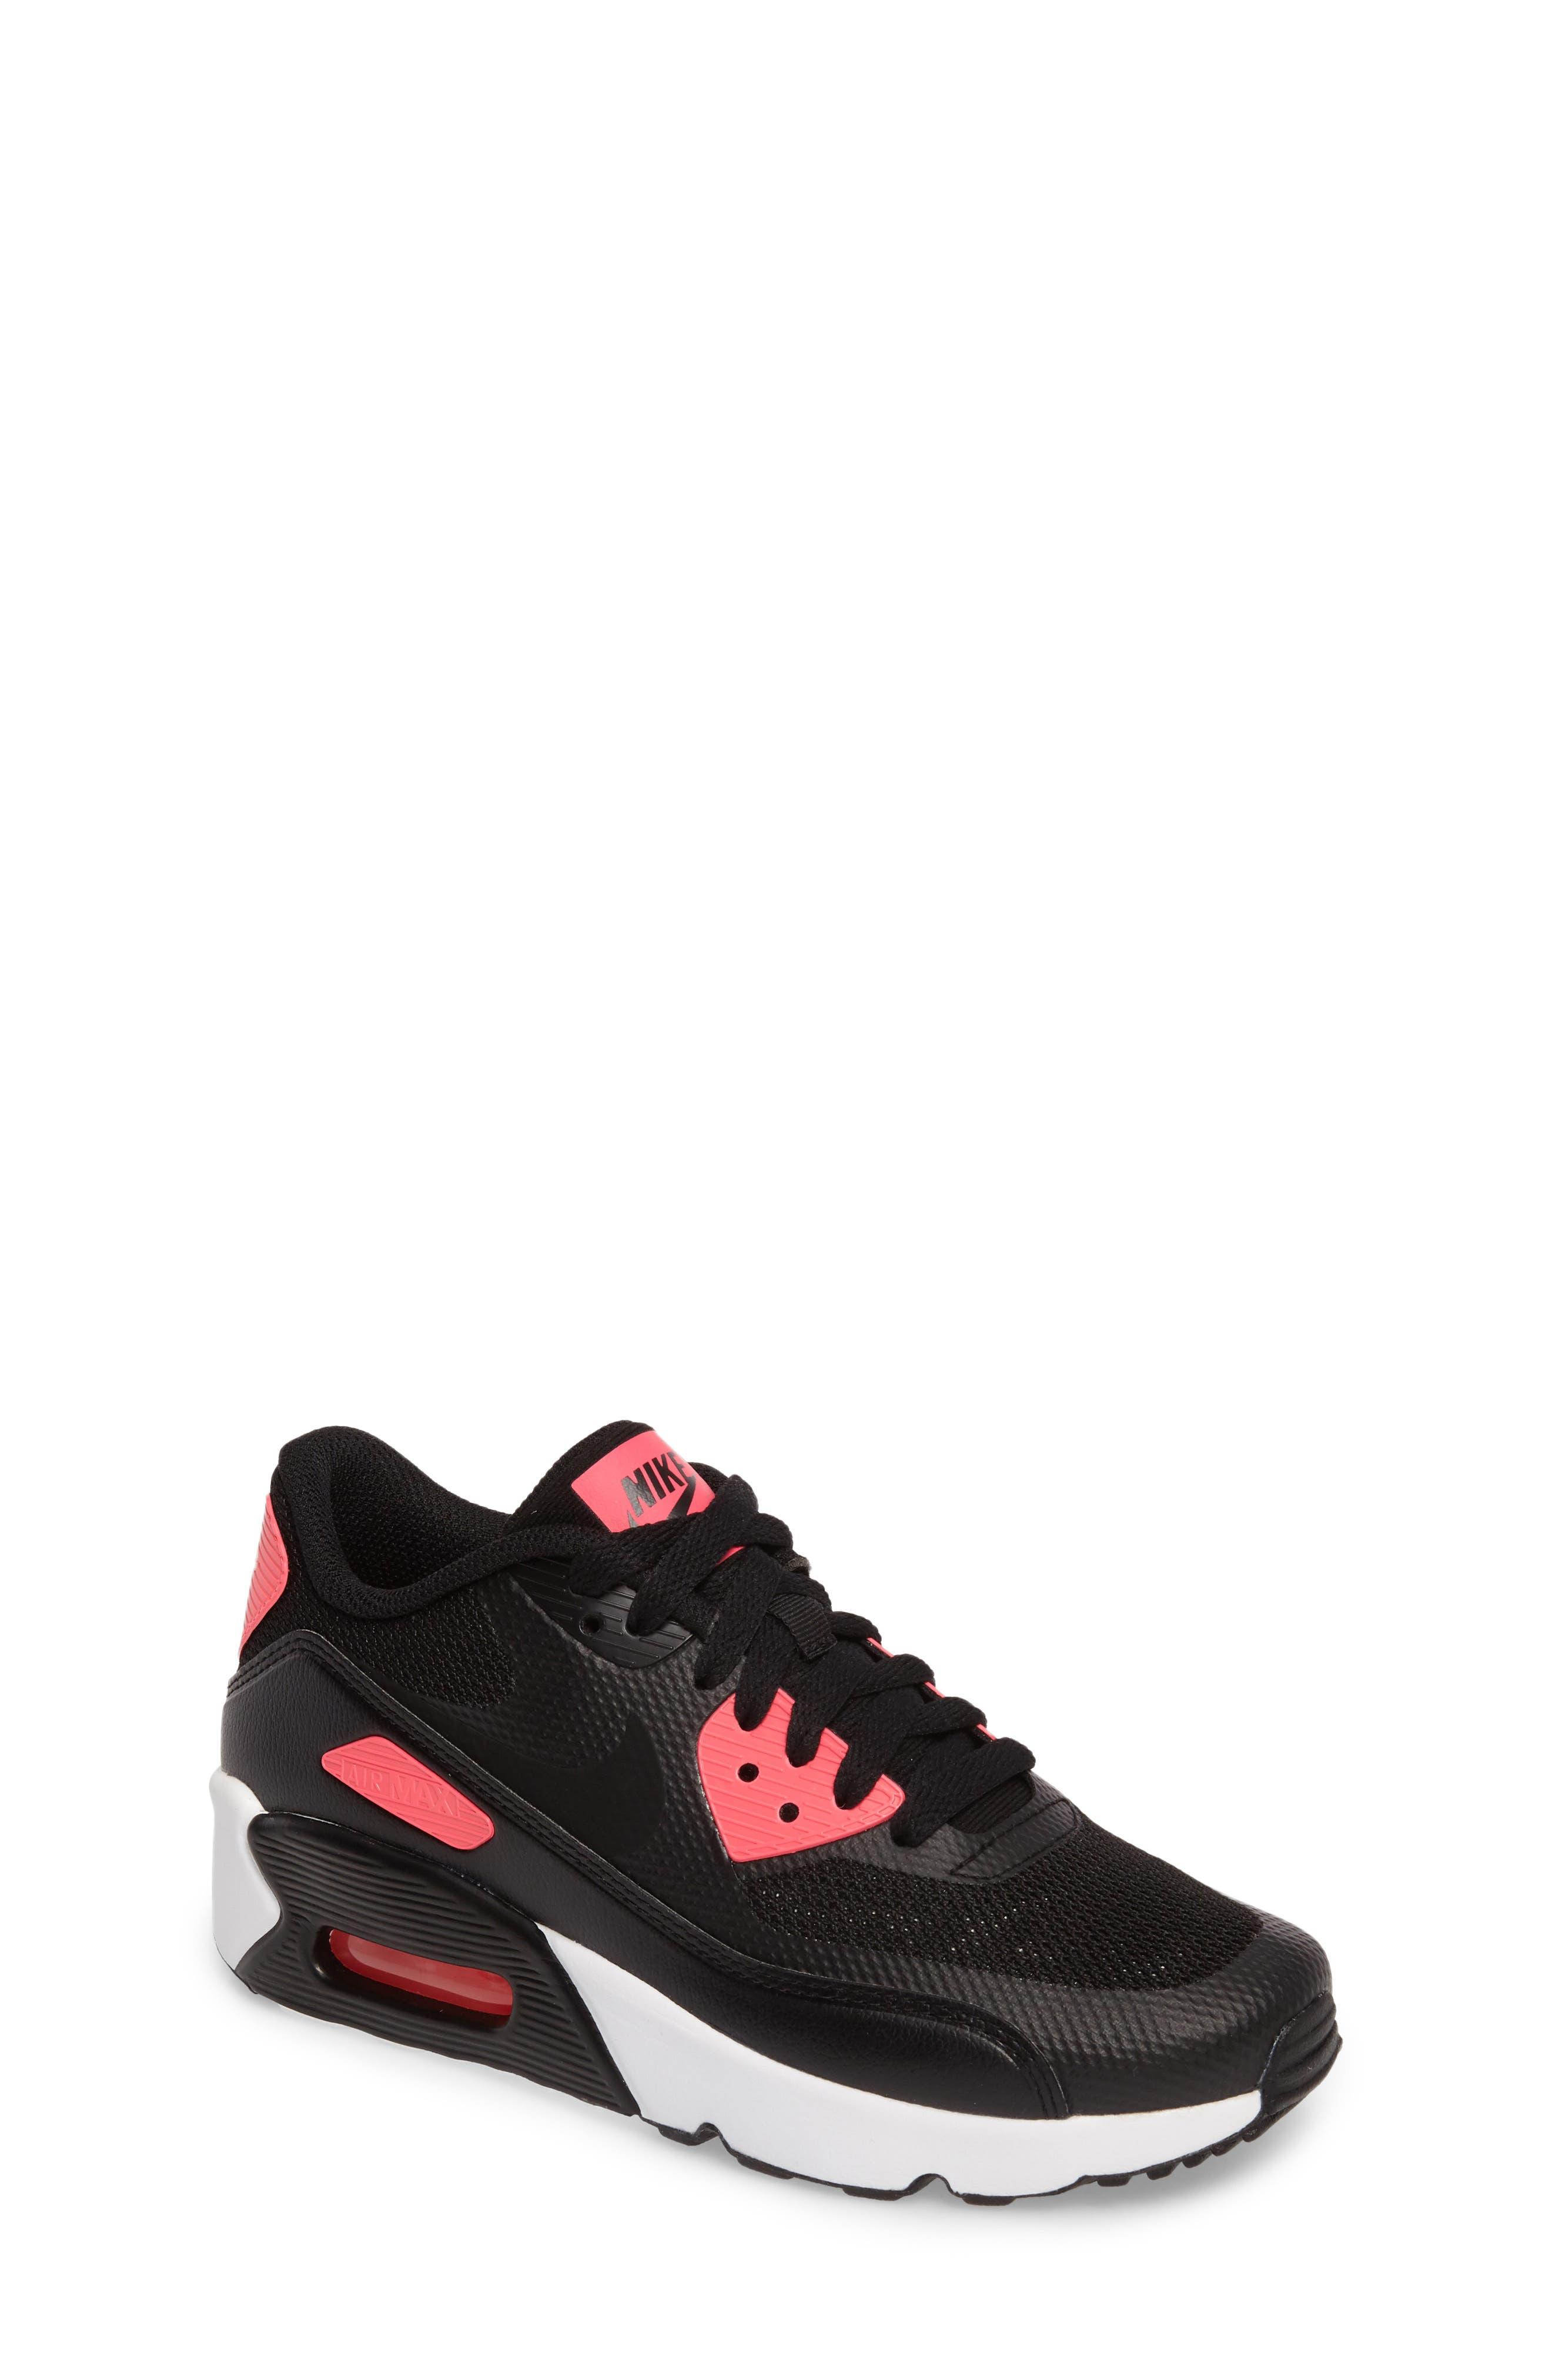 NIKE Air Max 90 Ultra 2.0 GS Sneaker